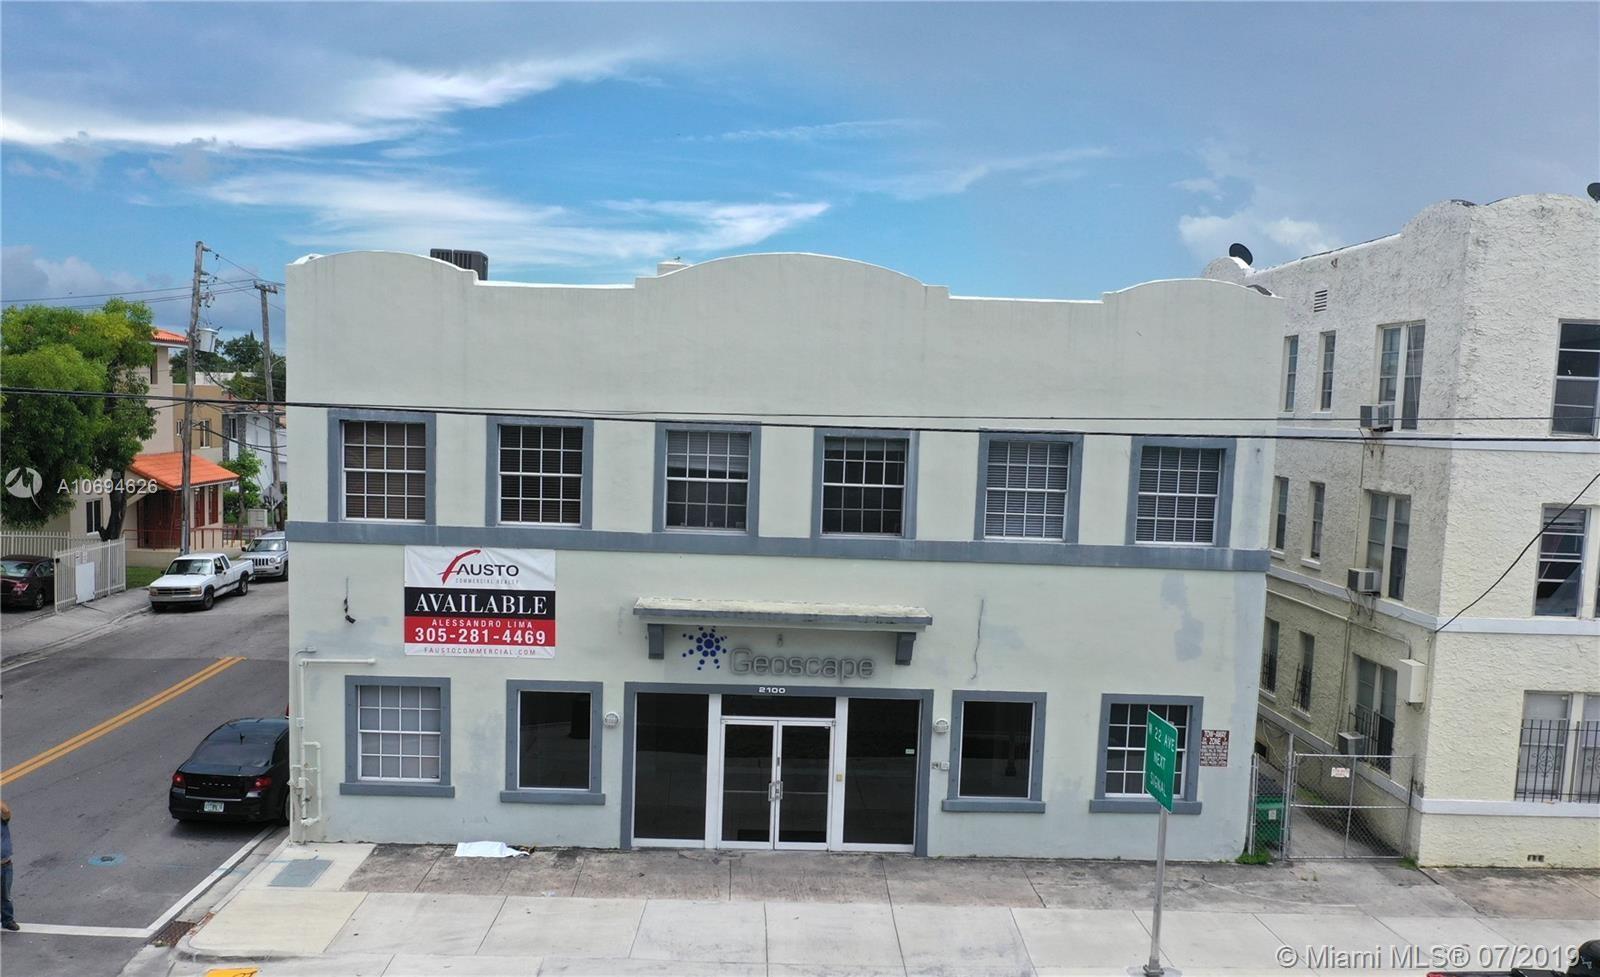 2100 W Flagler St, Miami, FL 33135